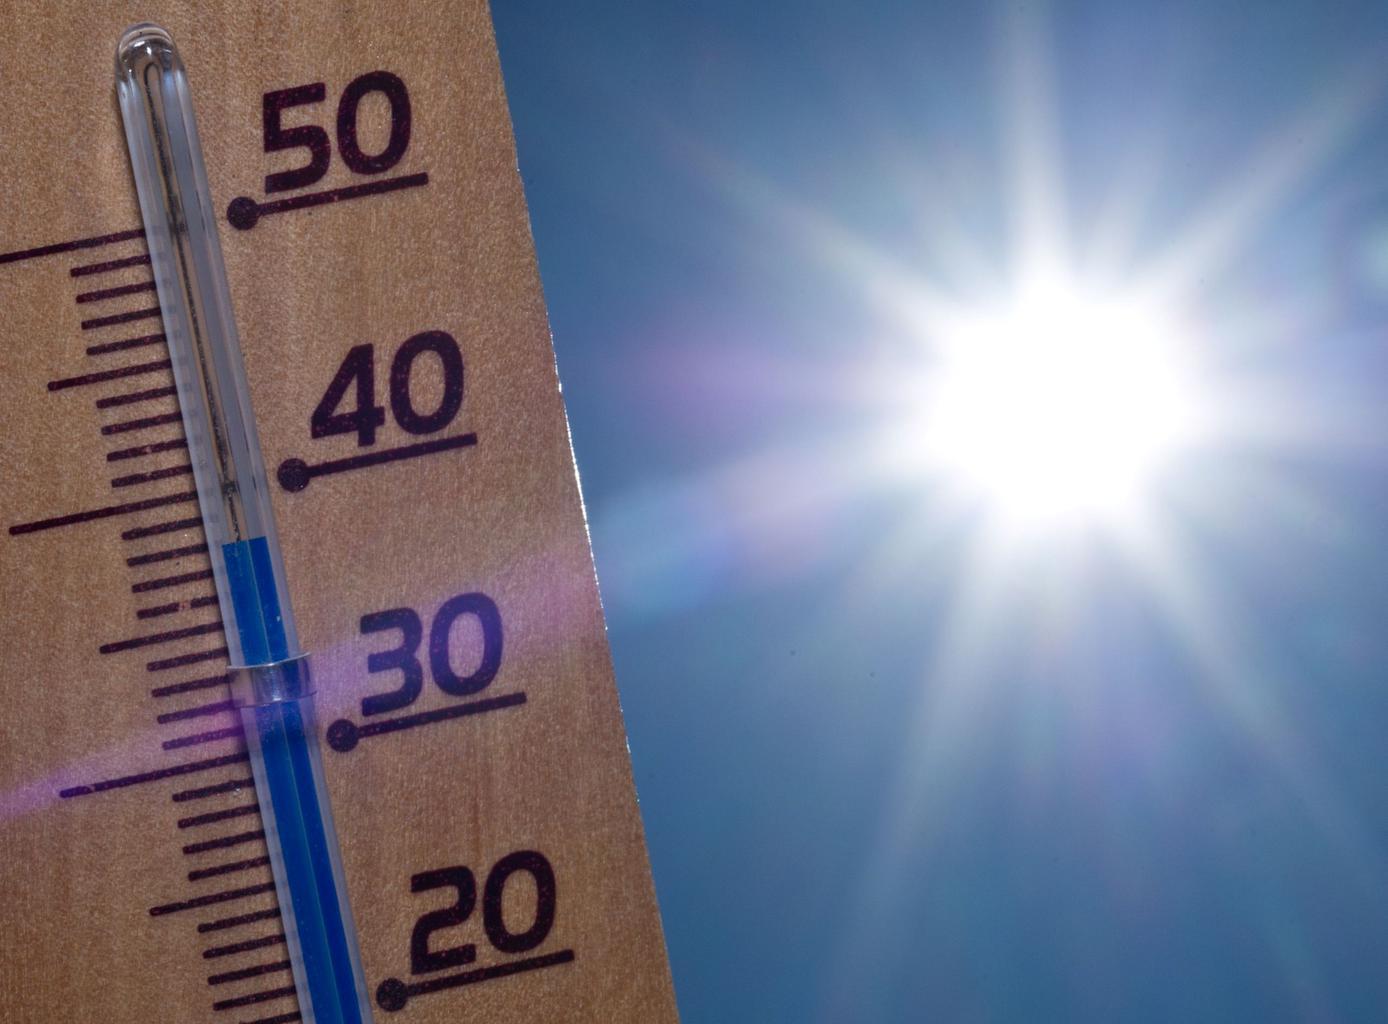 Ola de calor altas temperaturas